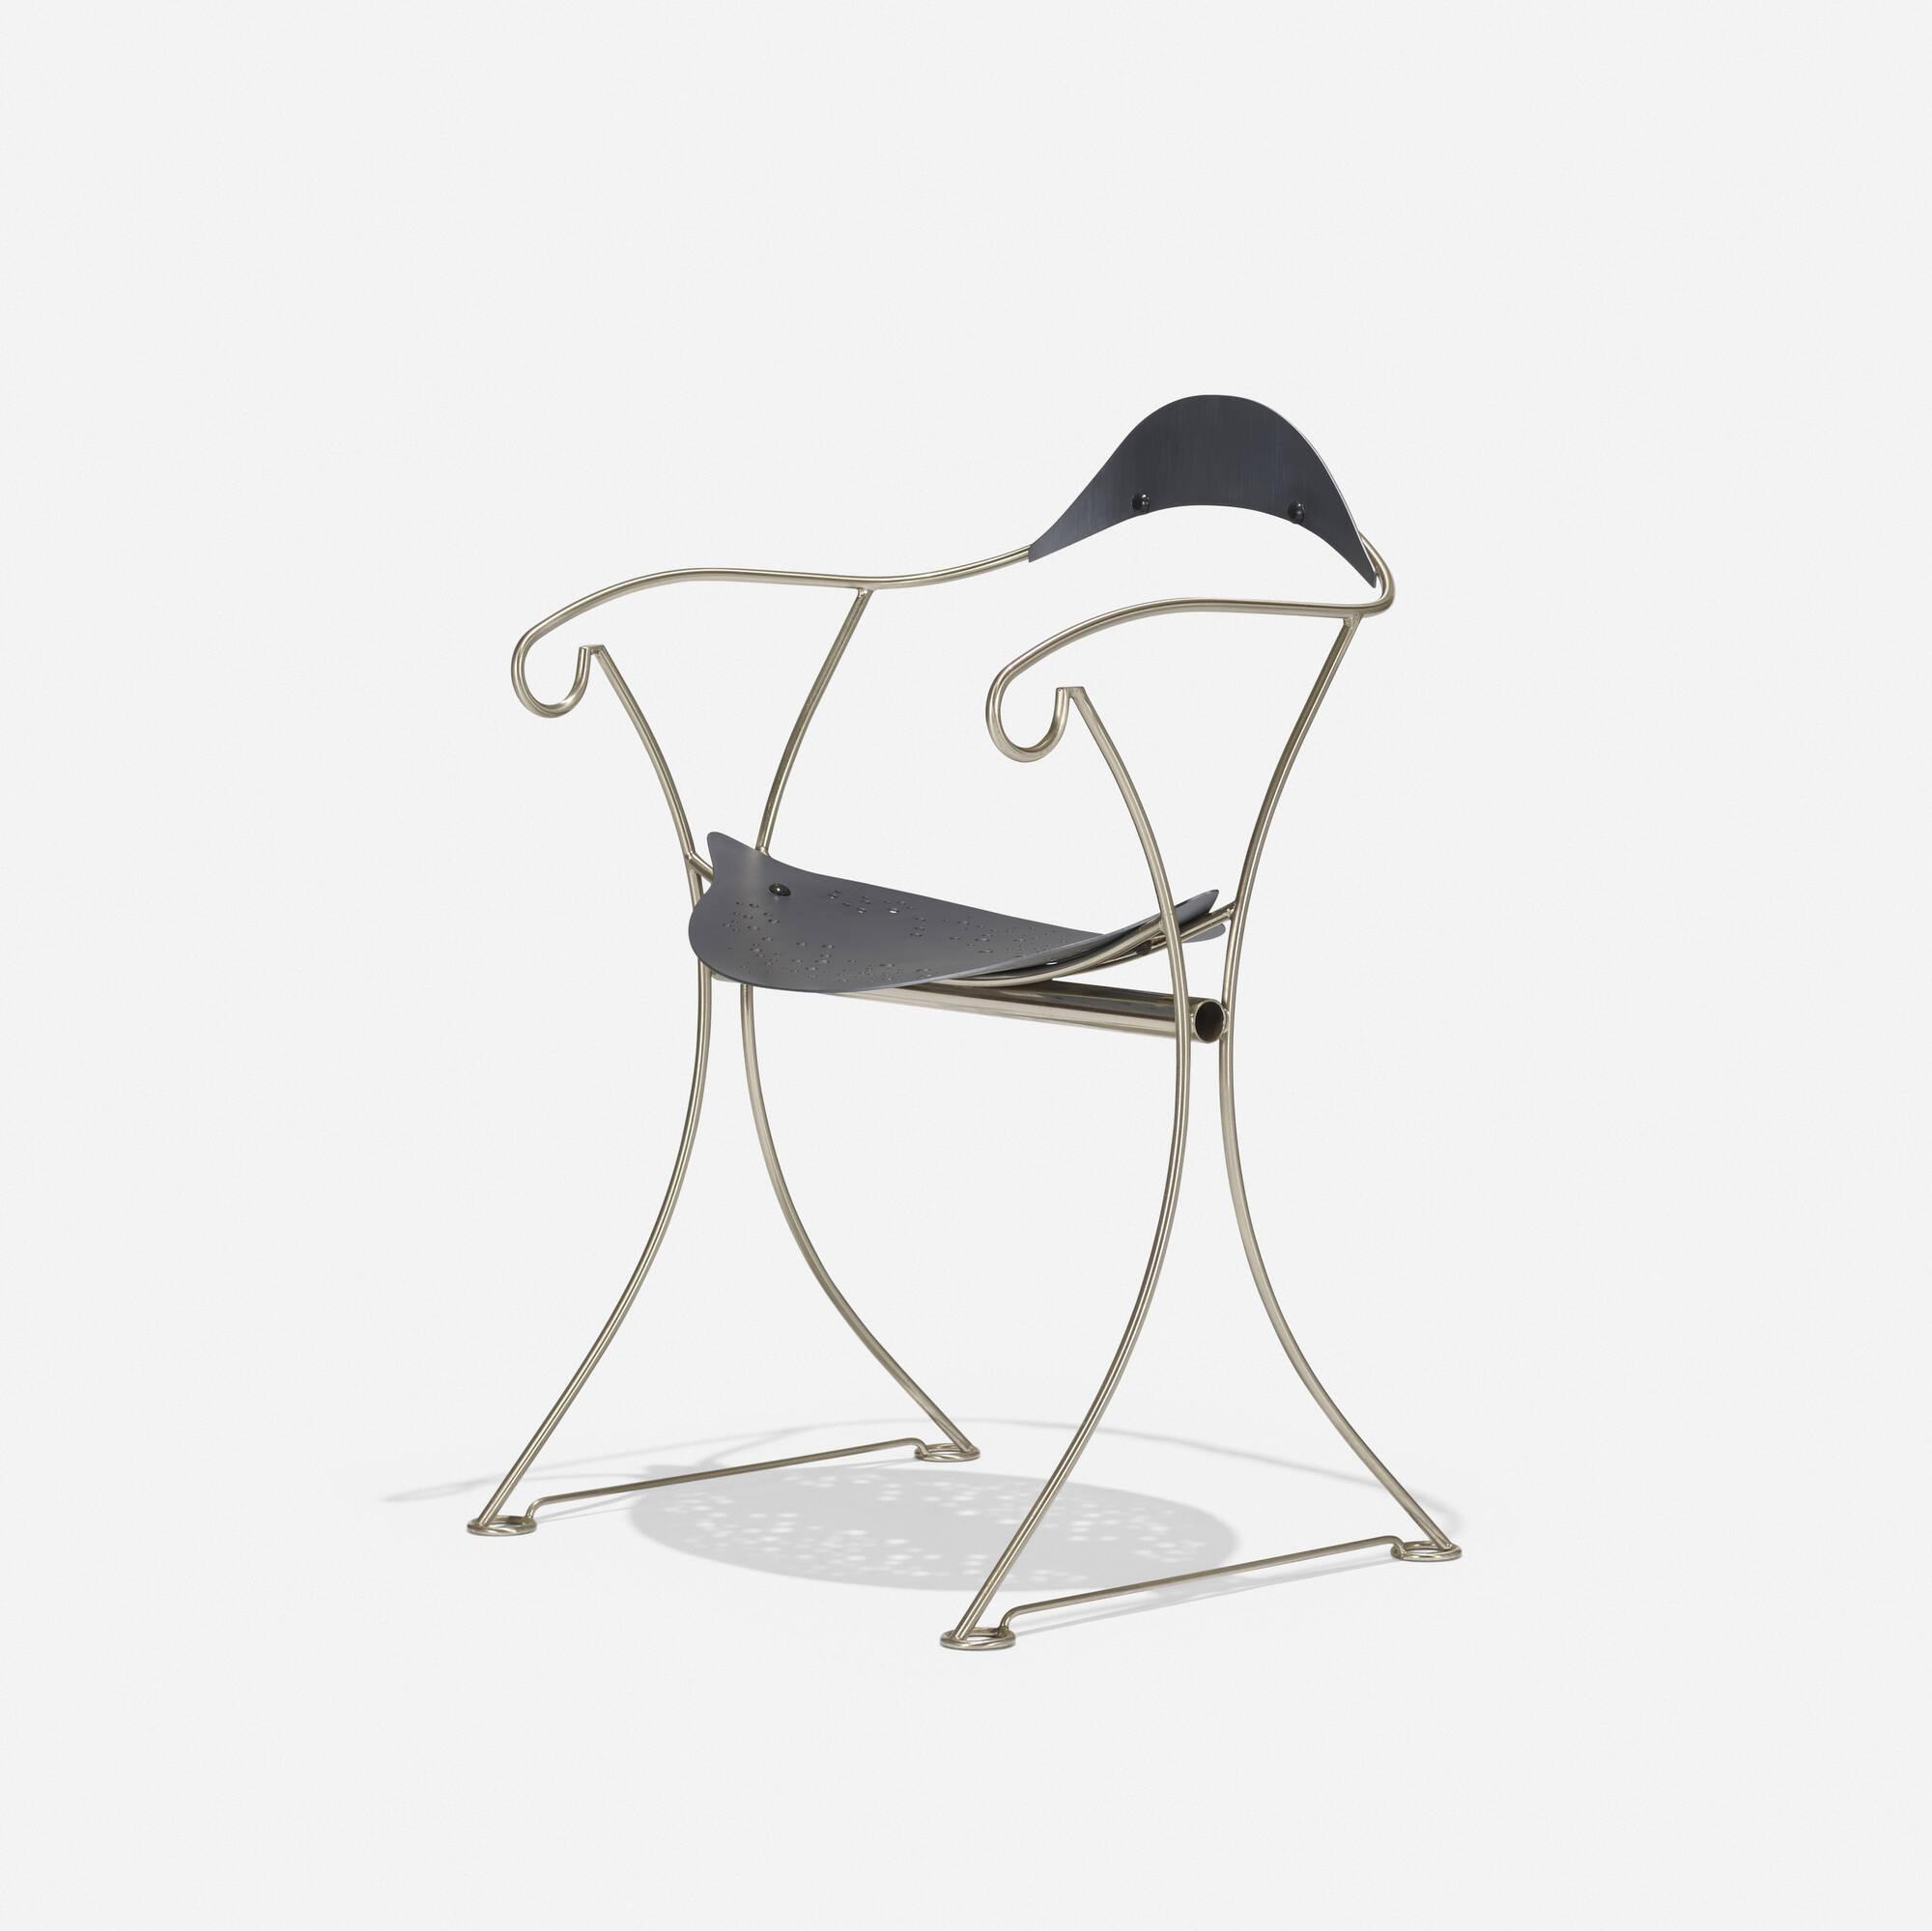 412: Riccardo Dalisi / Clessidra chair (1 of 3)